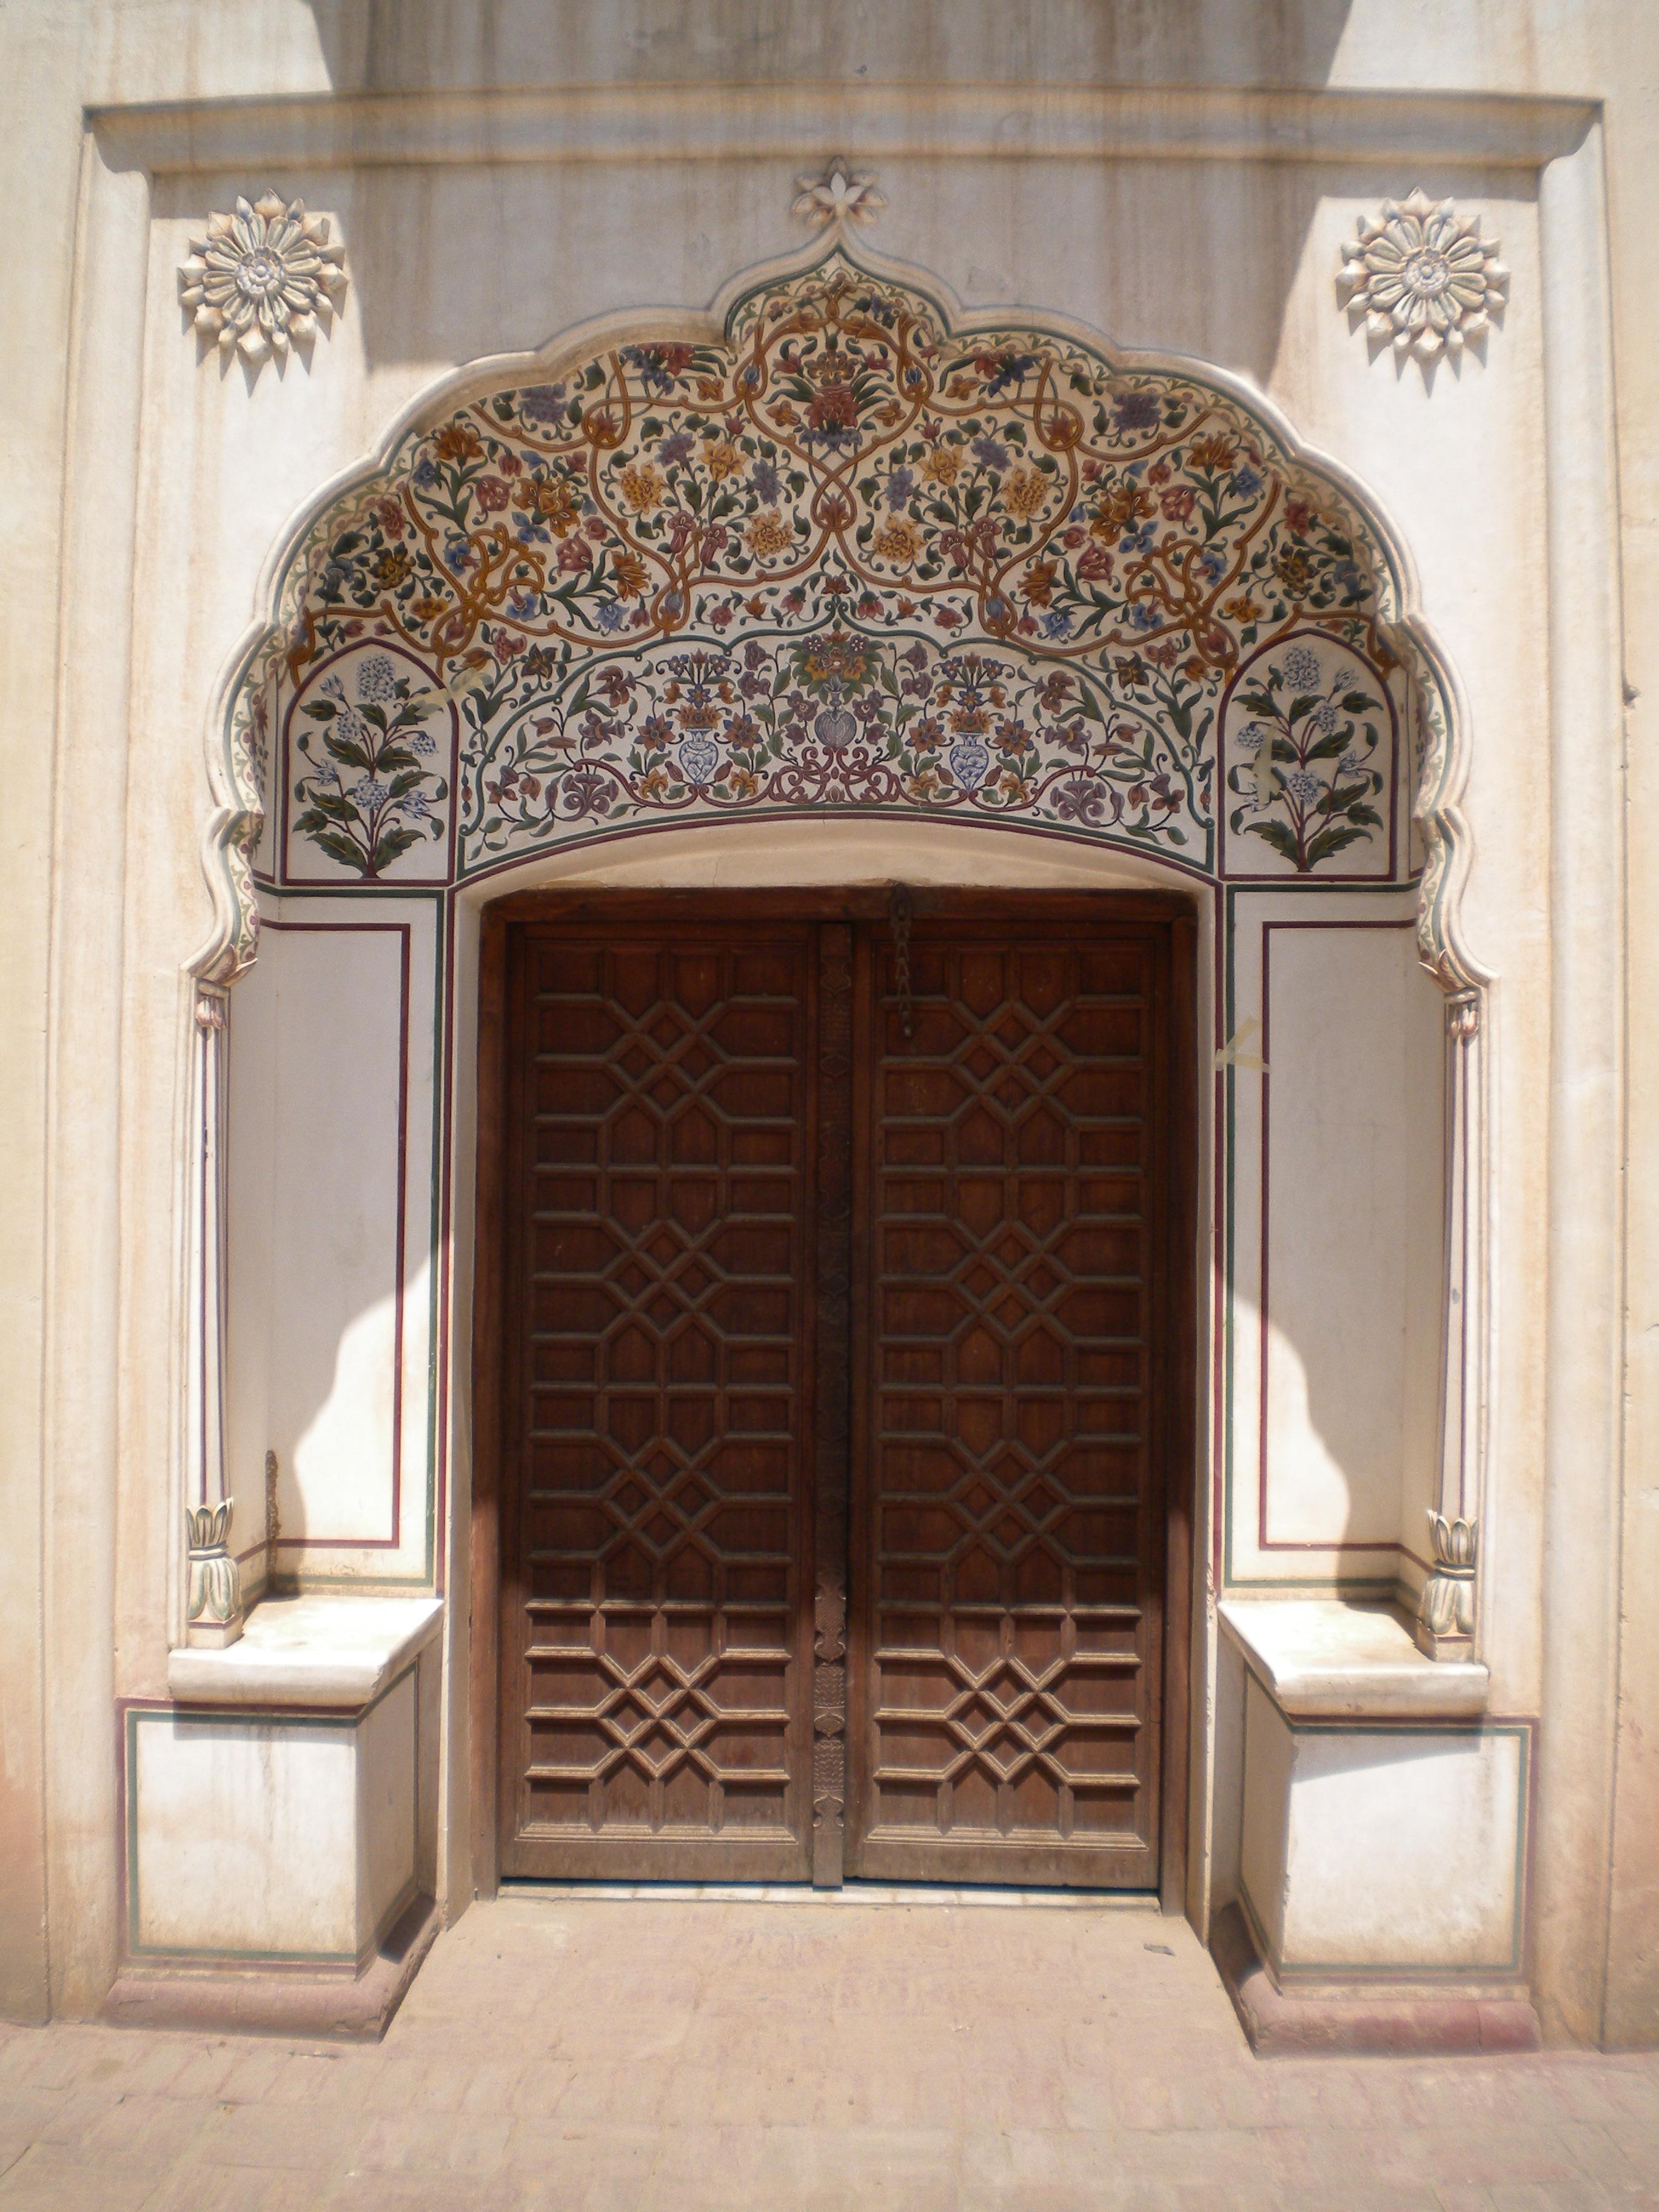 File:Punjabi Decorated Door.jpg - Wikimedia Commons